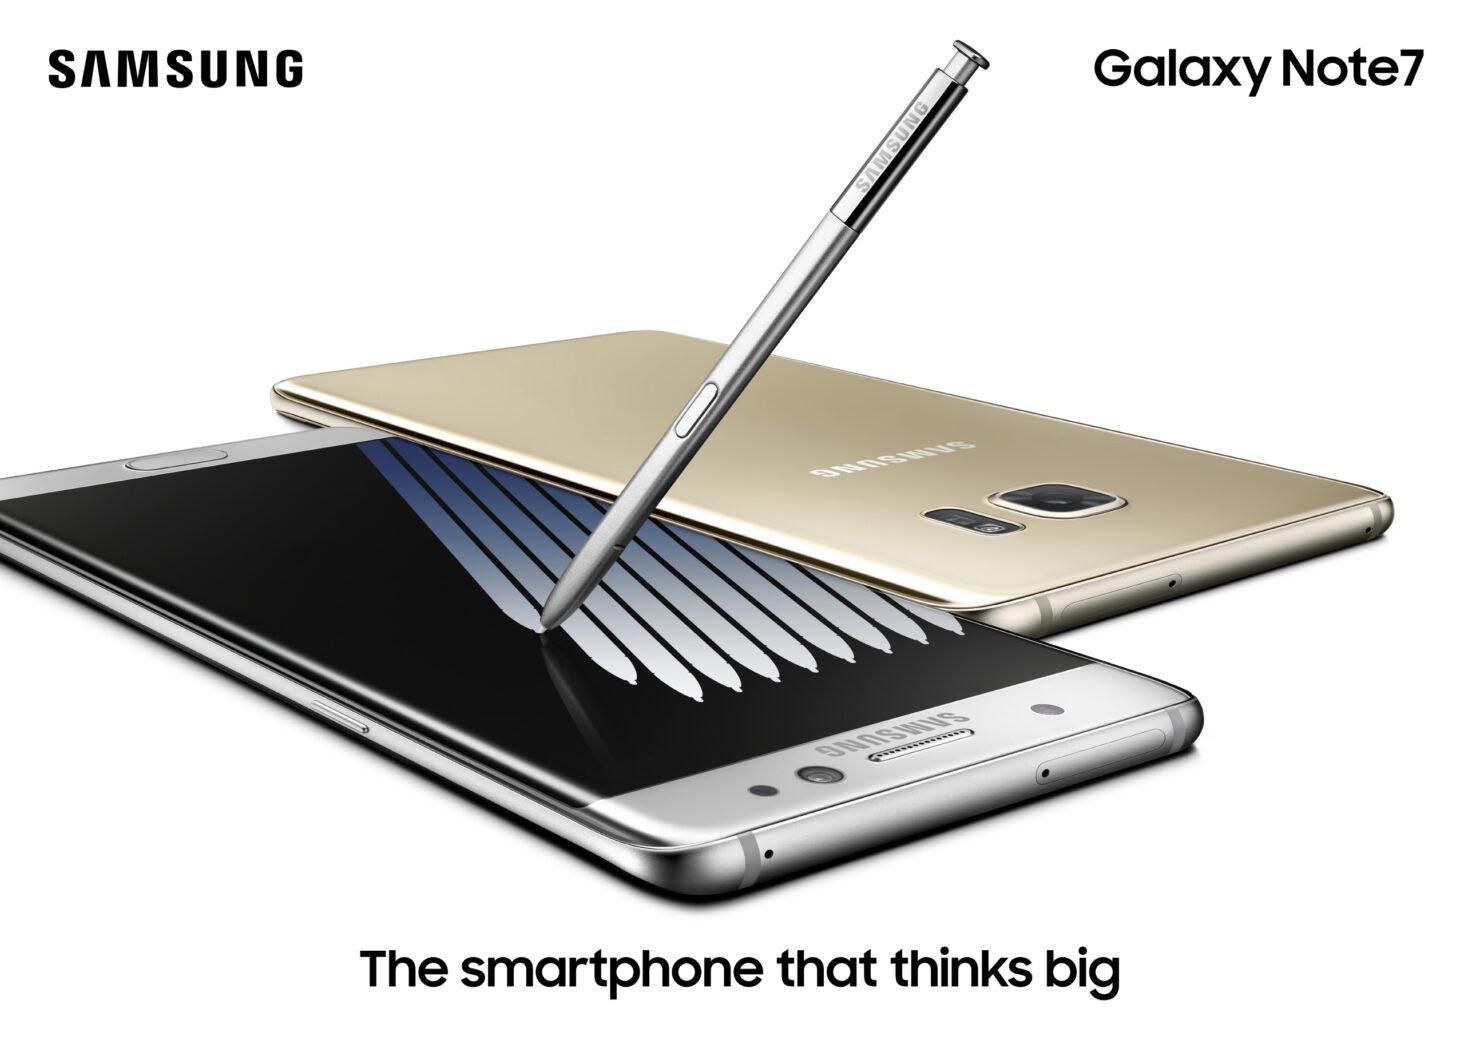 galaxy-note7-key-visual-note7_silver_gold_28642194731_o